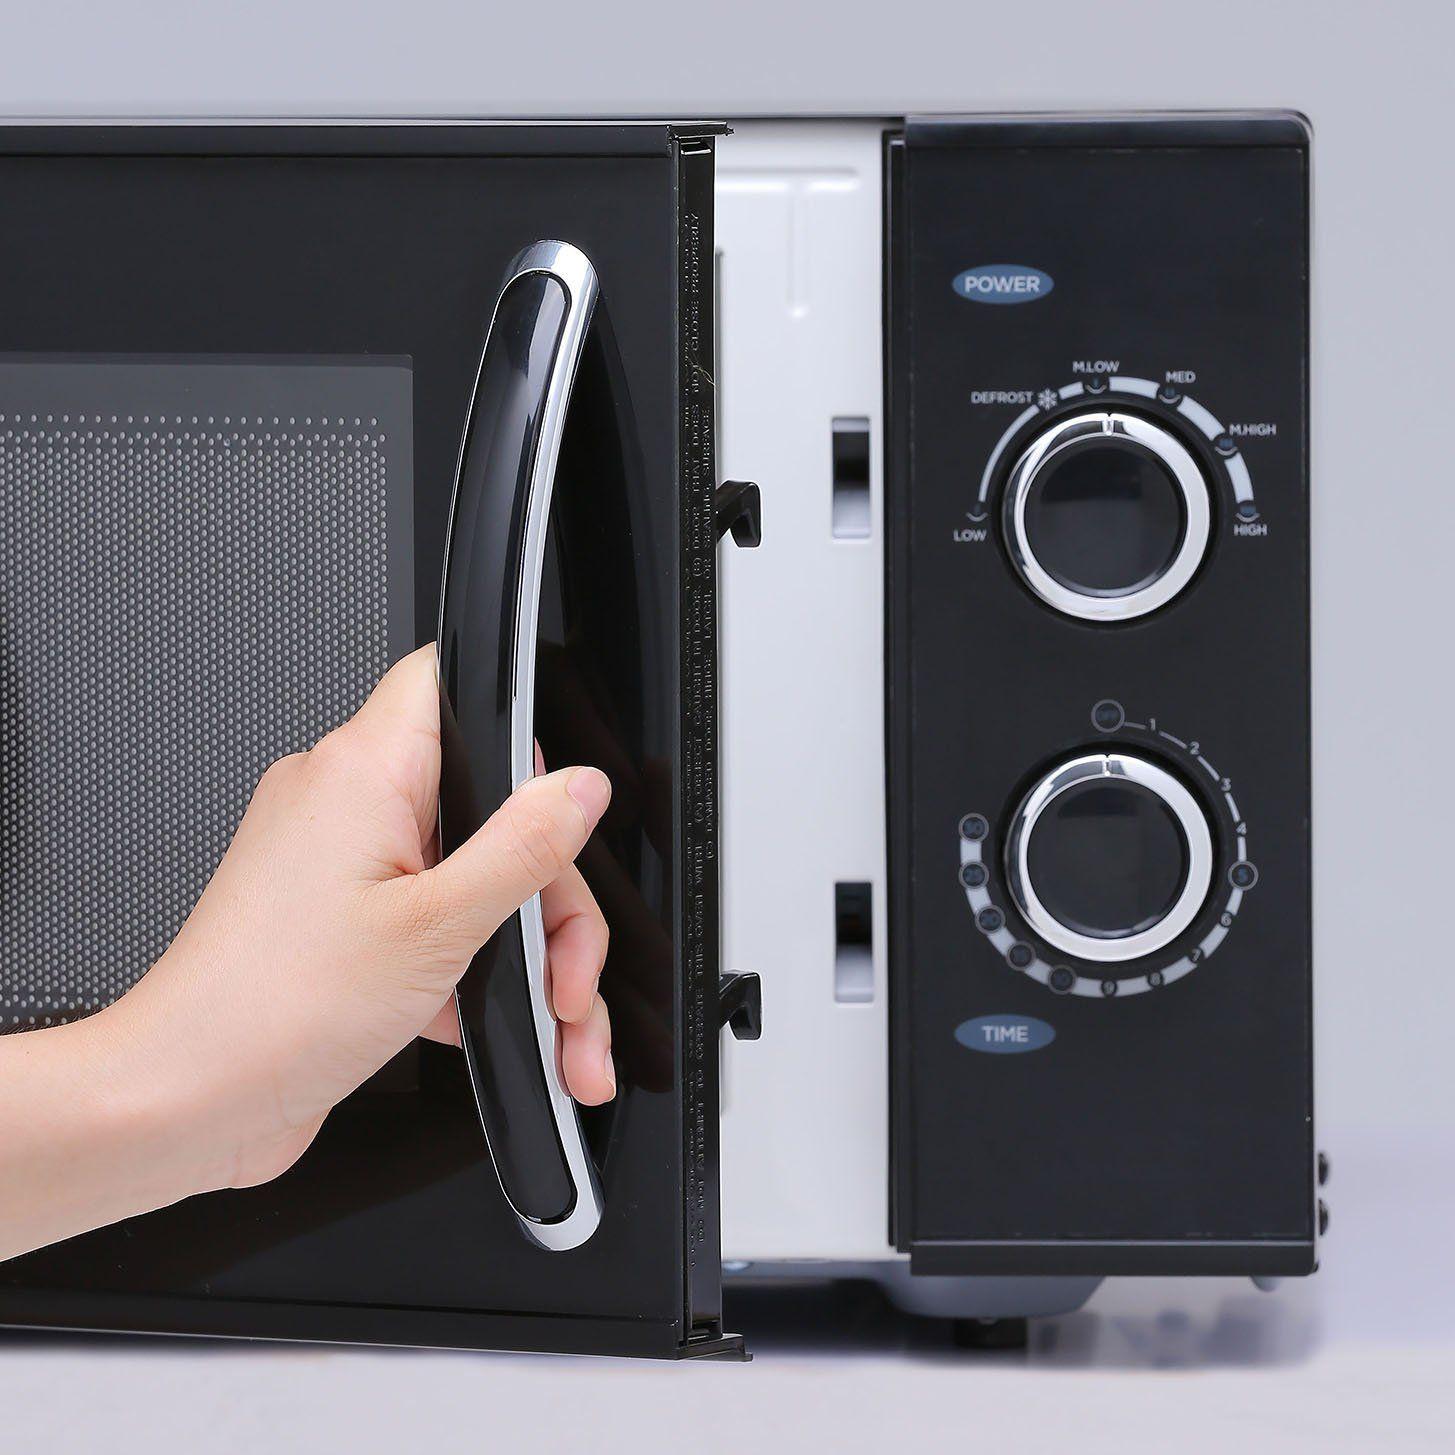 Counter Top Rotary Microwave Oven 0 9 Cubic Feet 900 Watt Black